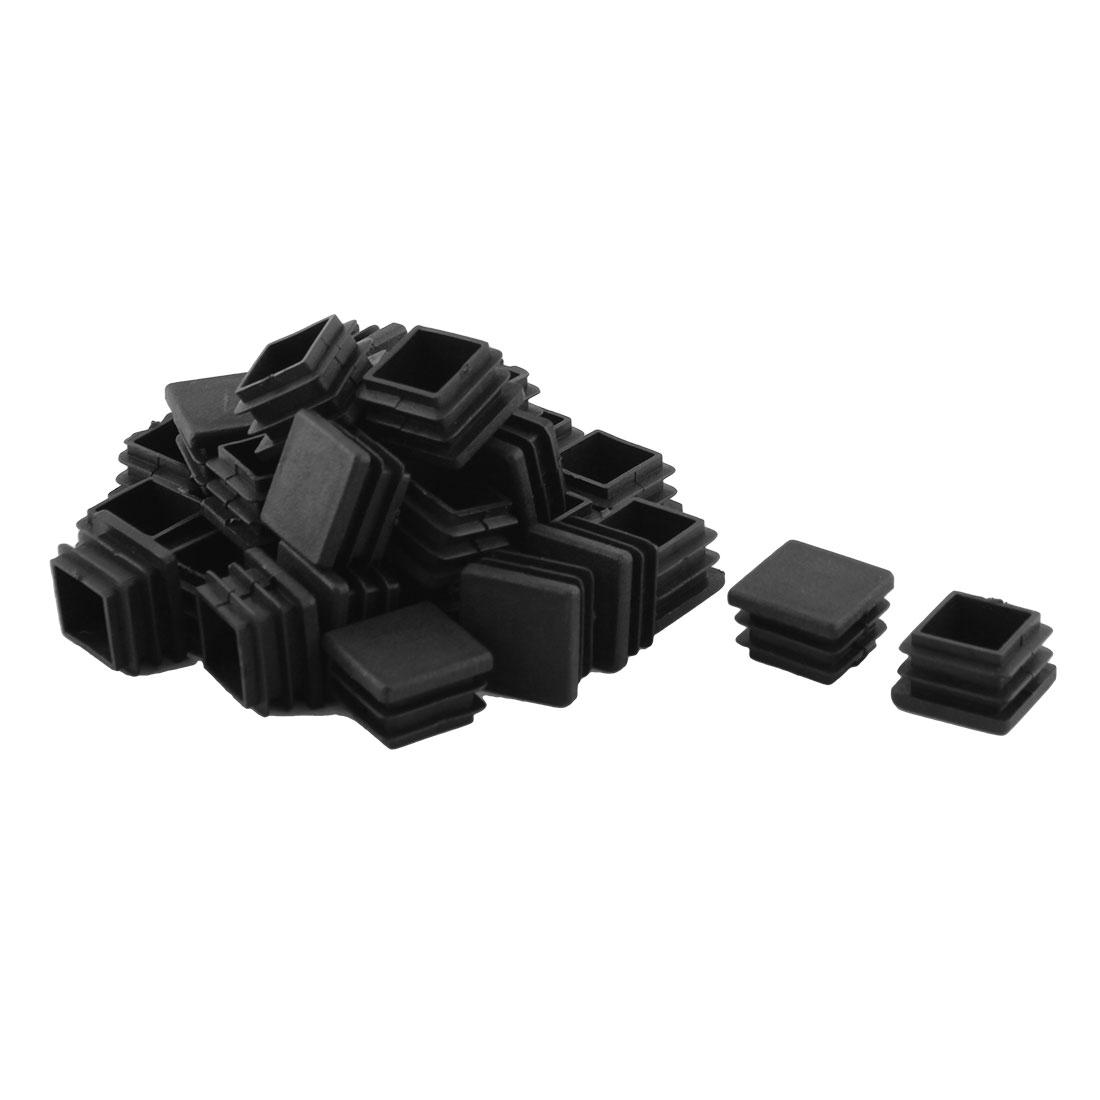 Home Office Plastic Square Table Chair Leg Tube Insert Black 20 x 20mm 30pcs